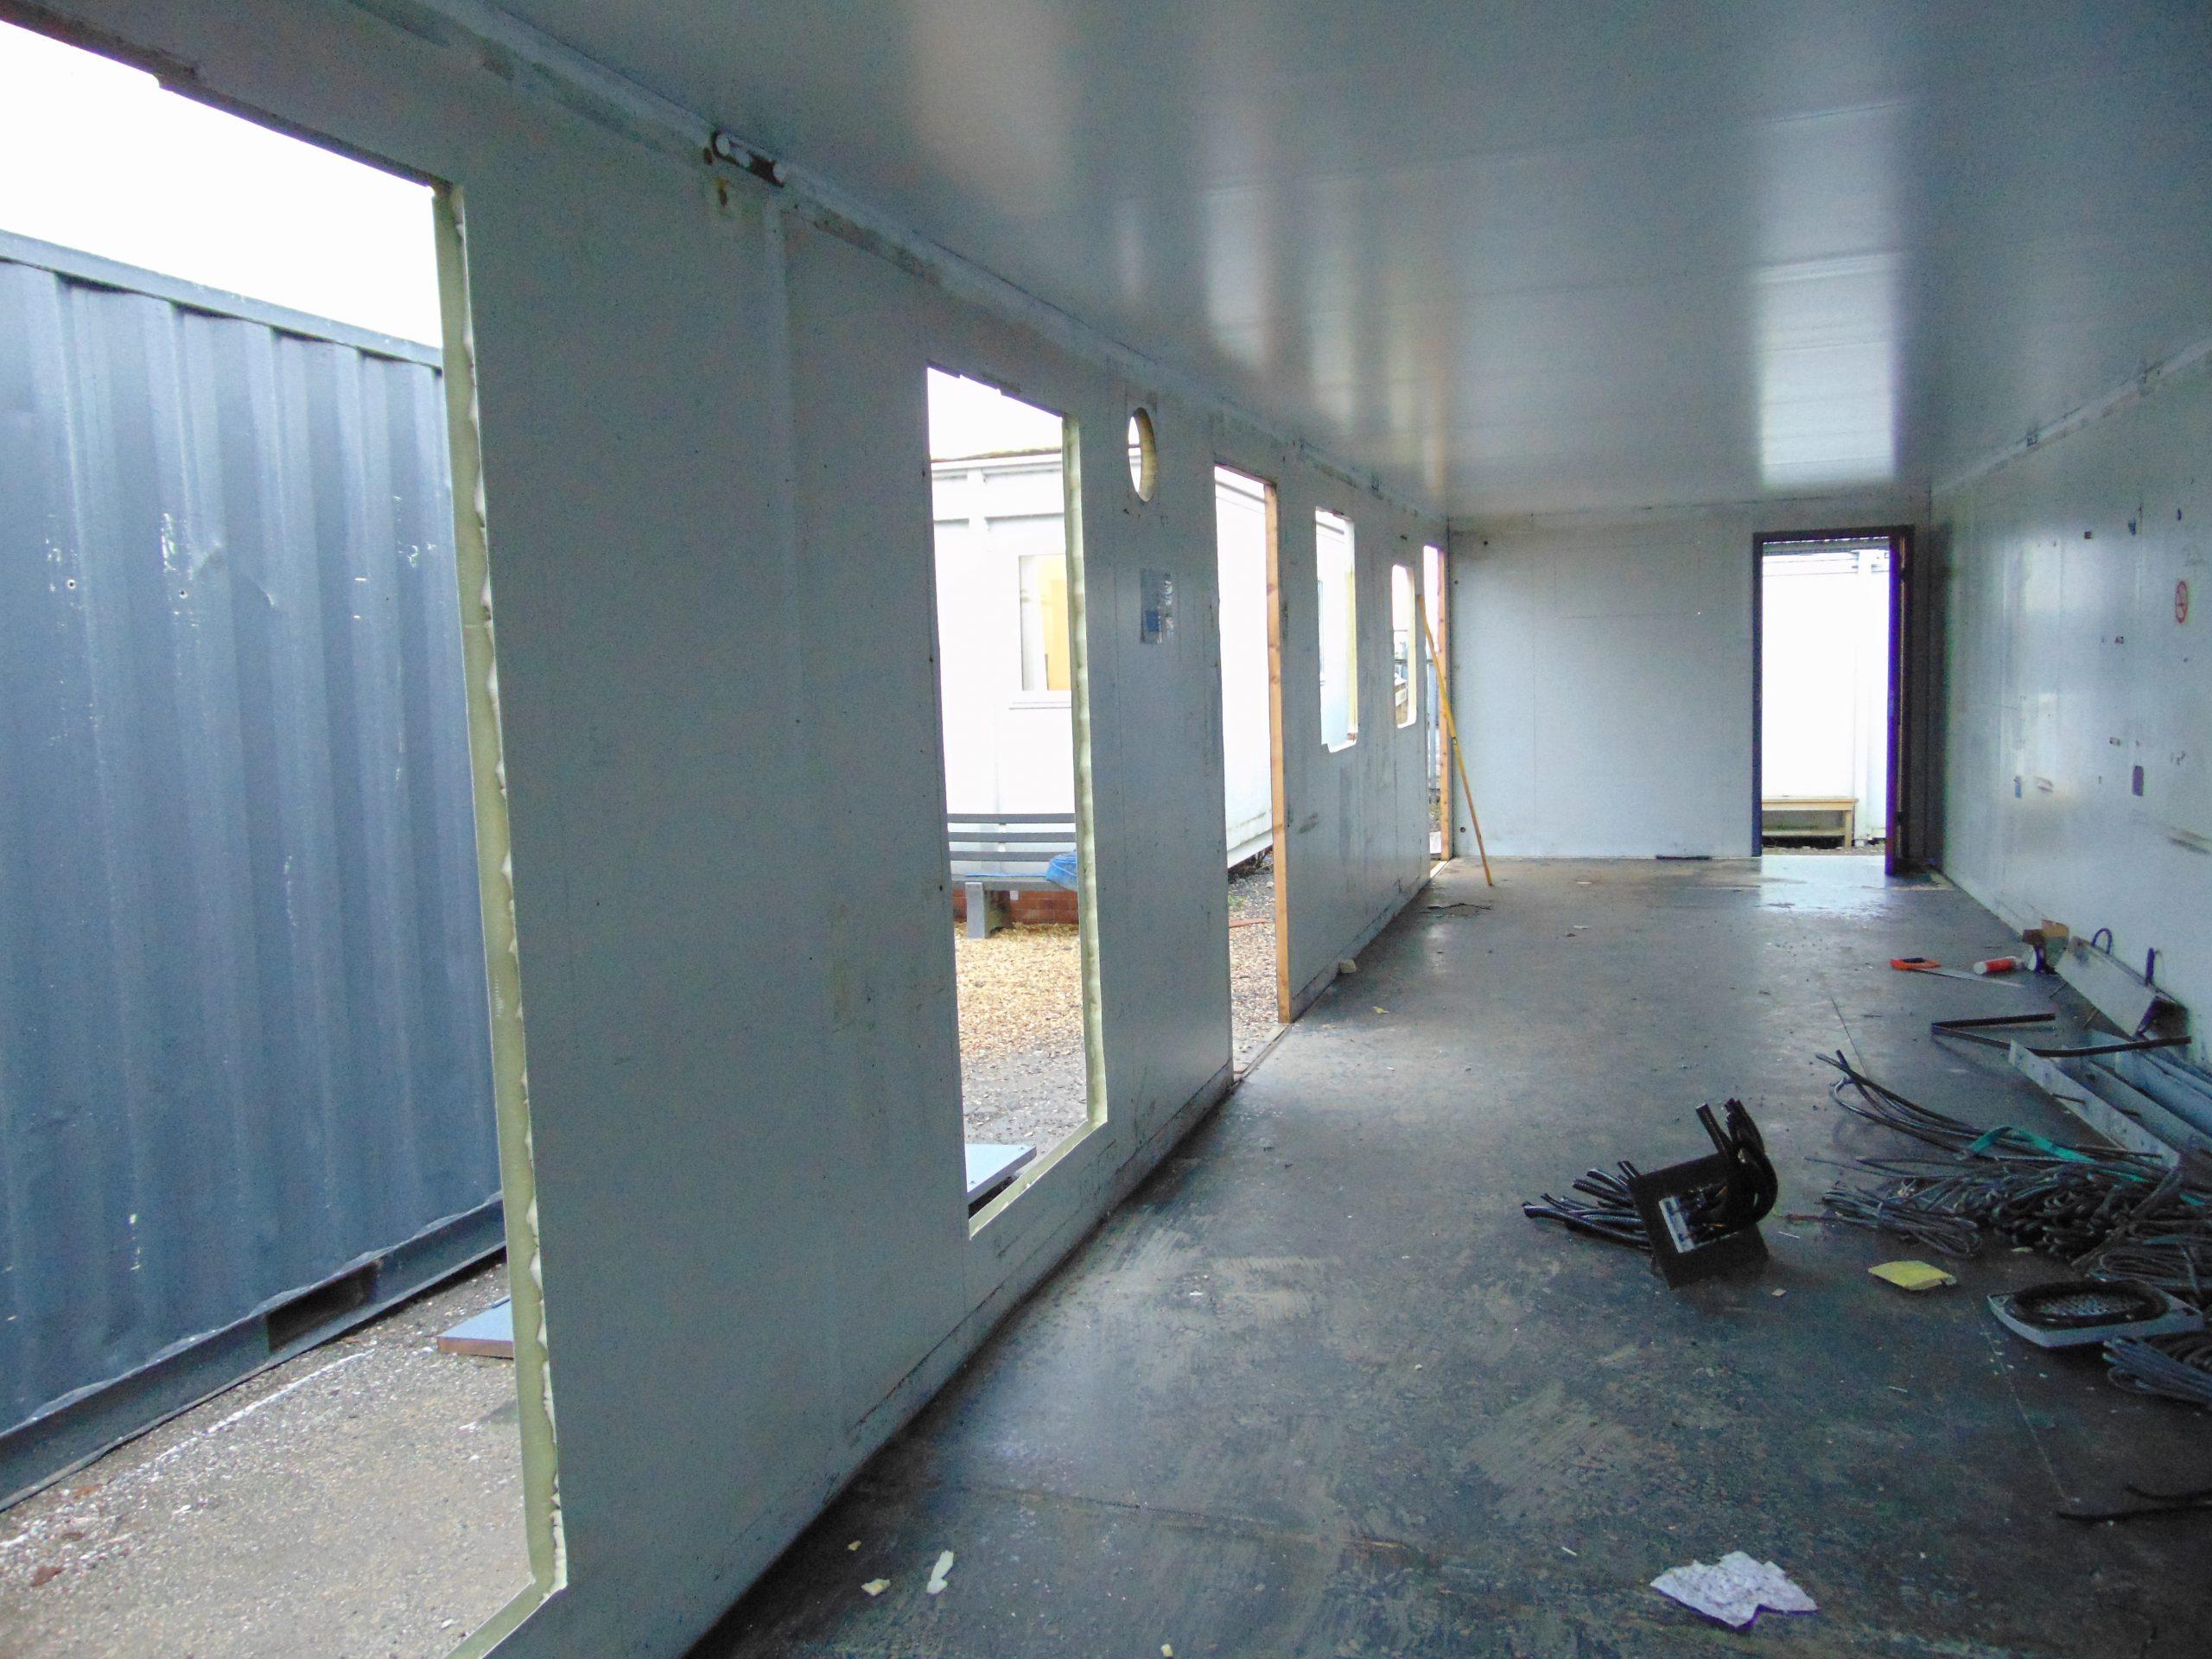 40' x 10' Portakabin refurbishment, portable cabin refurbishment,